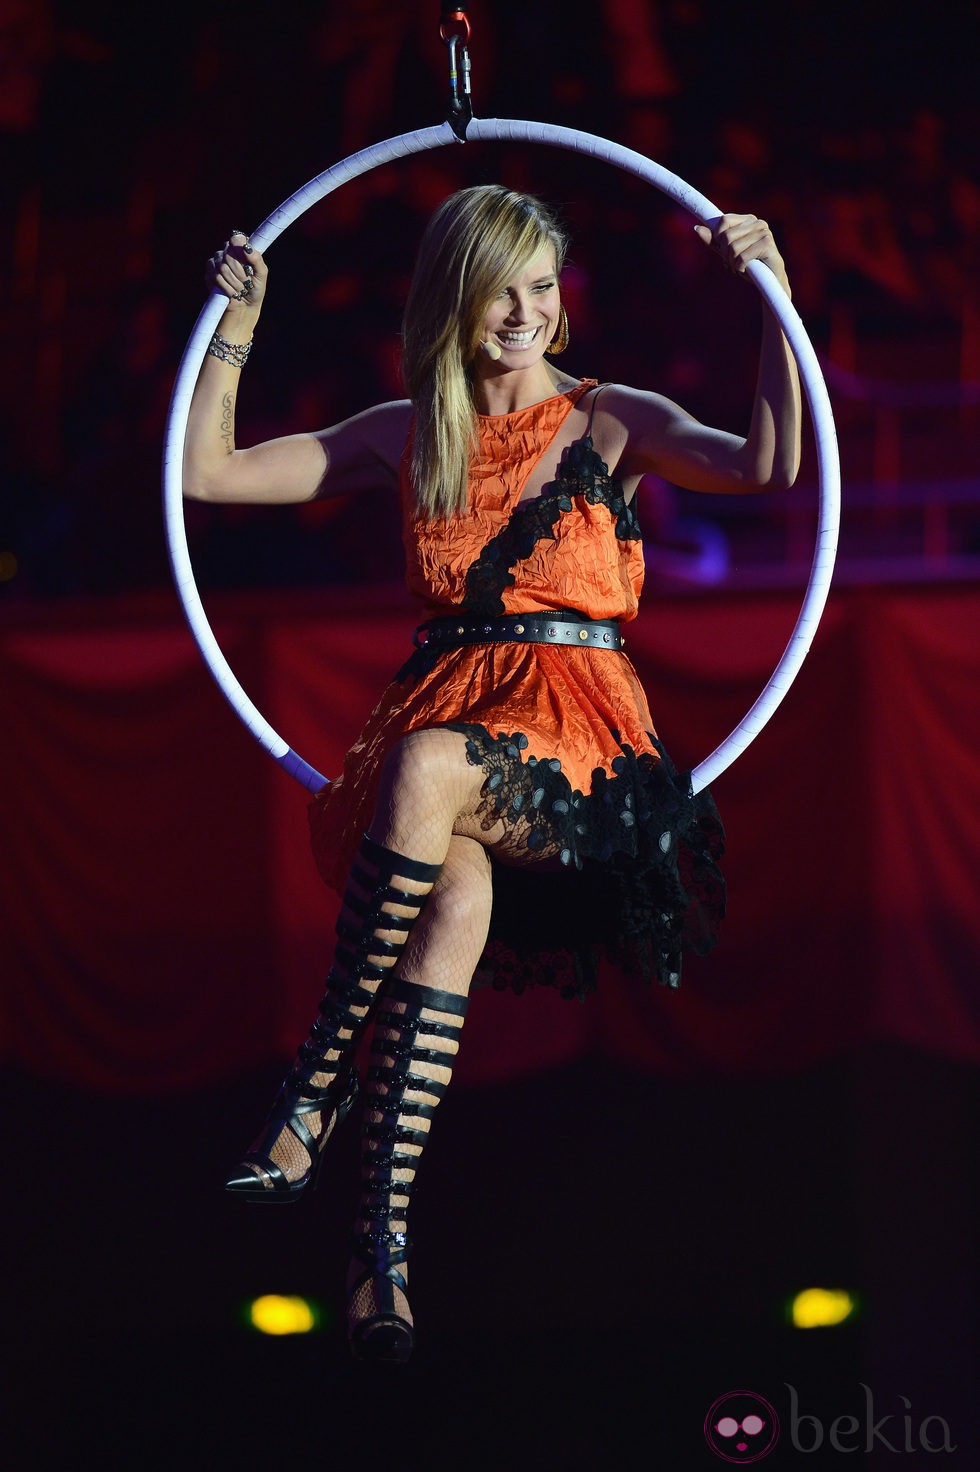 Heidi Klum subida en un columpio en los MTV Europe Music Awards 2012